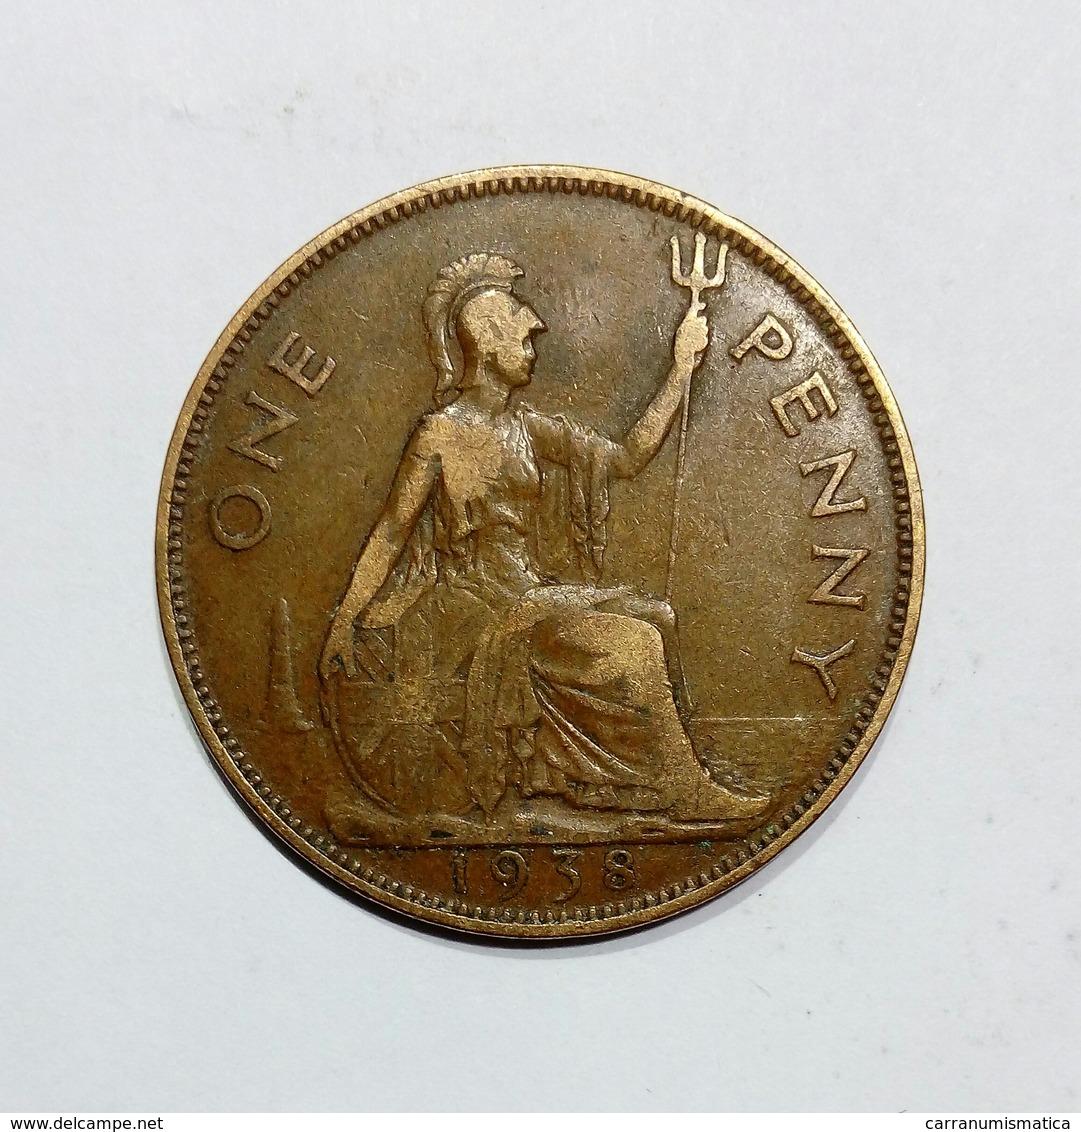 GREAT BRITAIN / GRAN BRETAGNA - One Penny ( 1938 ) GEORGE VI - D. 1 Penny